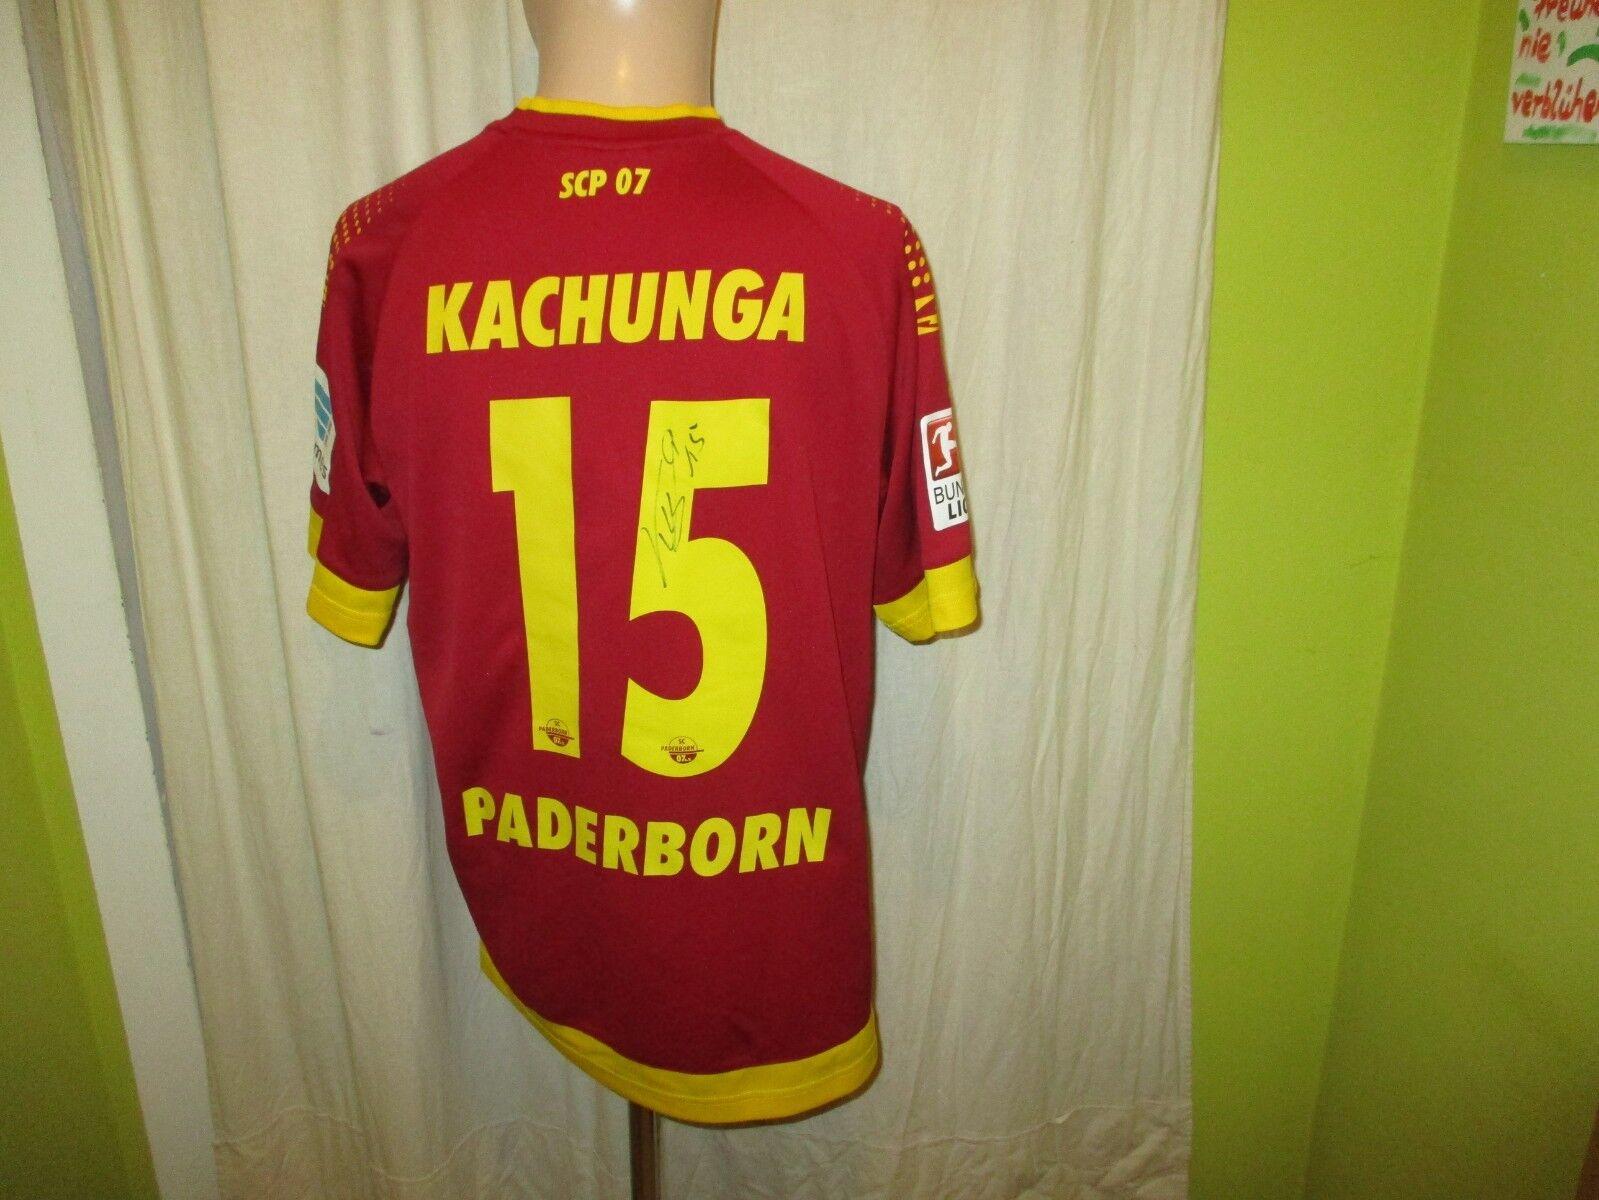 SC PADERBORN Saller Matchworn Jersey 2014 15 + no 15 kachunga + Signed Größe M